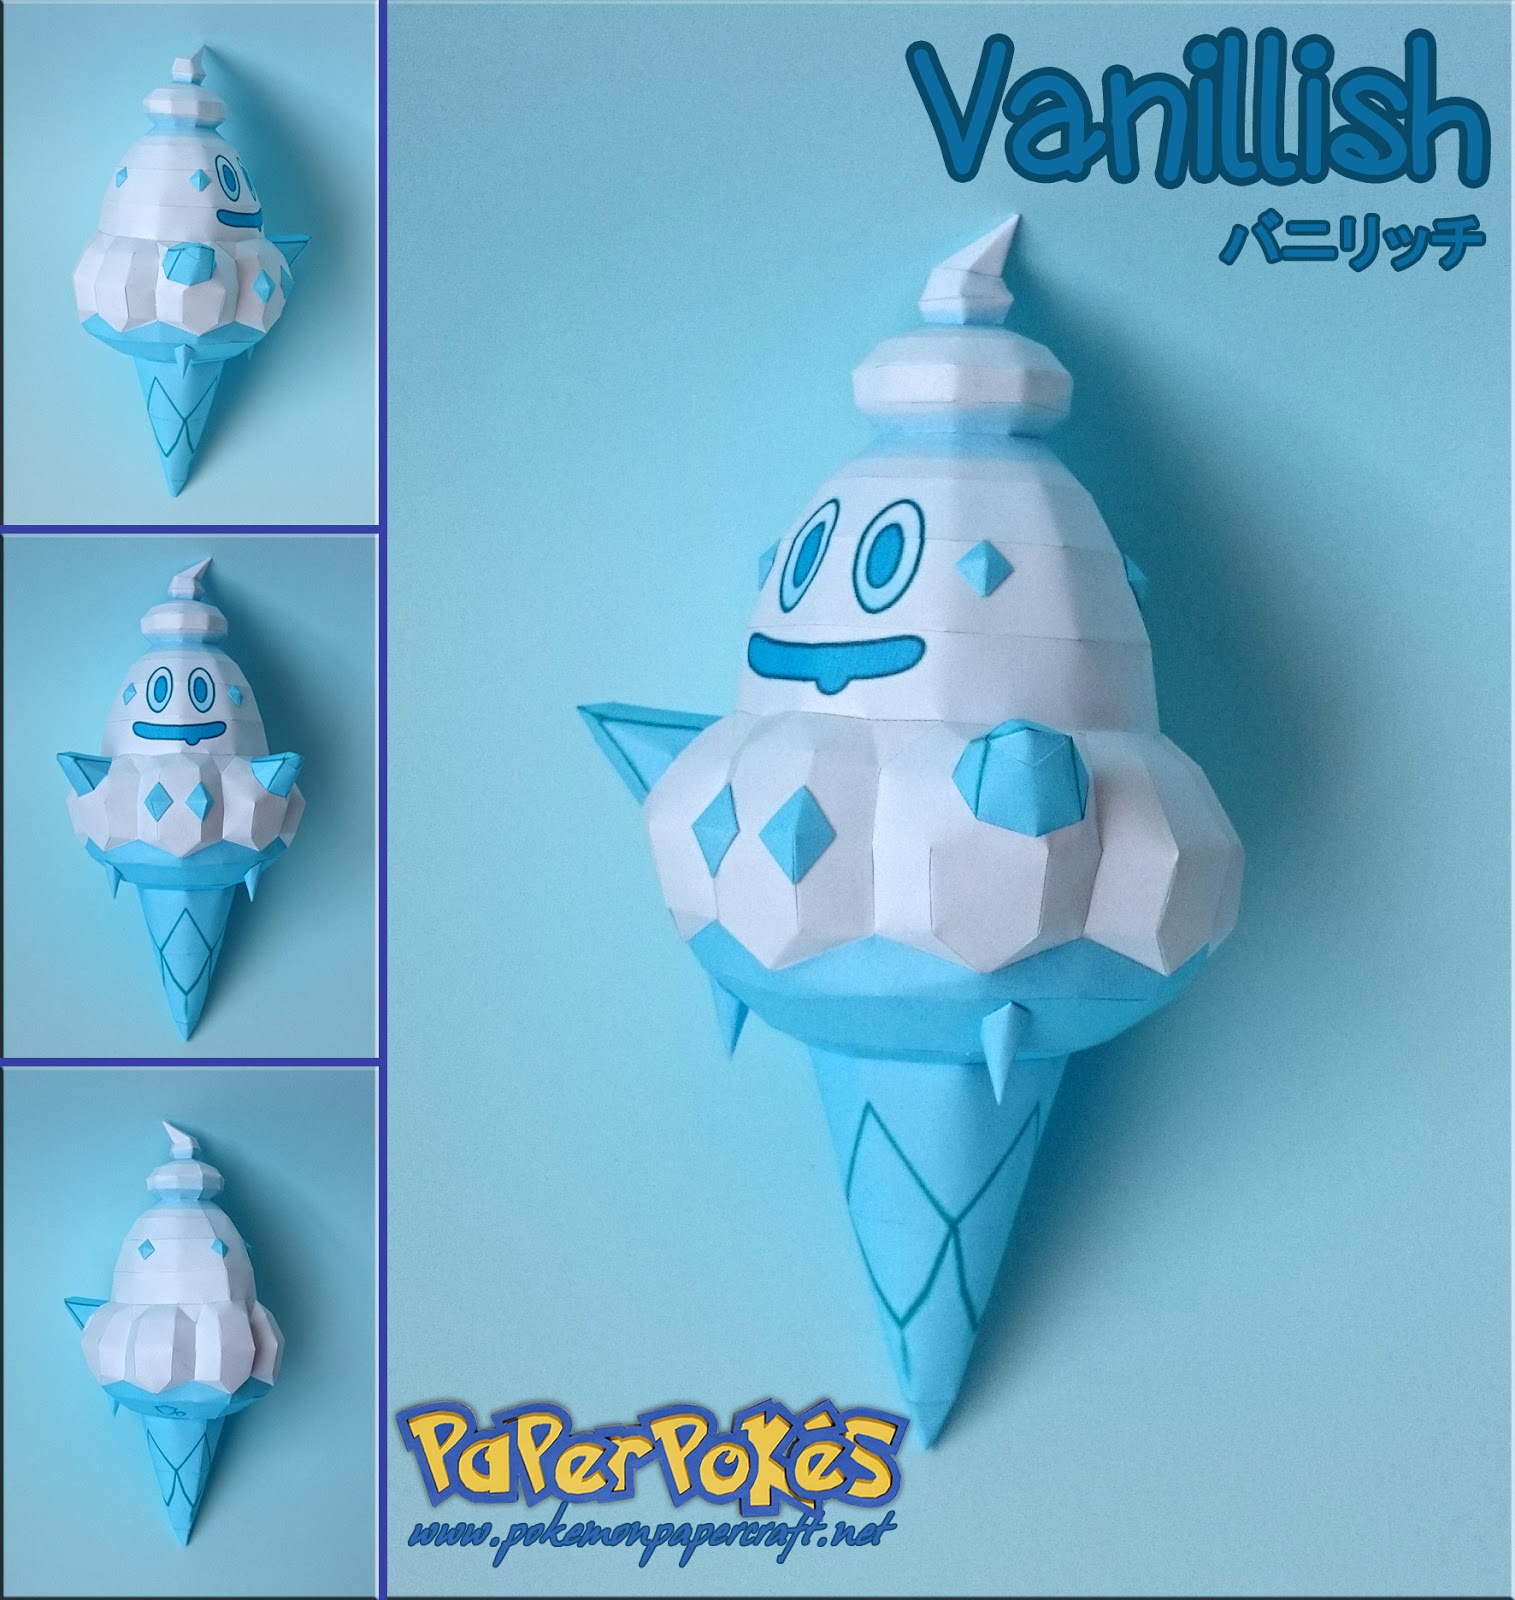 Paperpokés - Pokémon Papercraft: VANILLISH for Ice Cream Pokemon Evolution  111bof